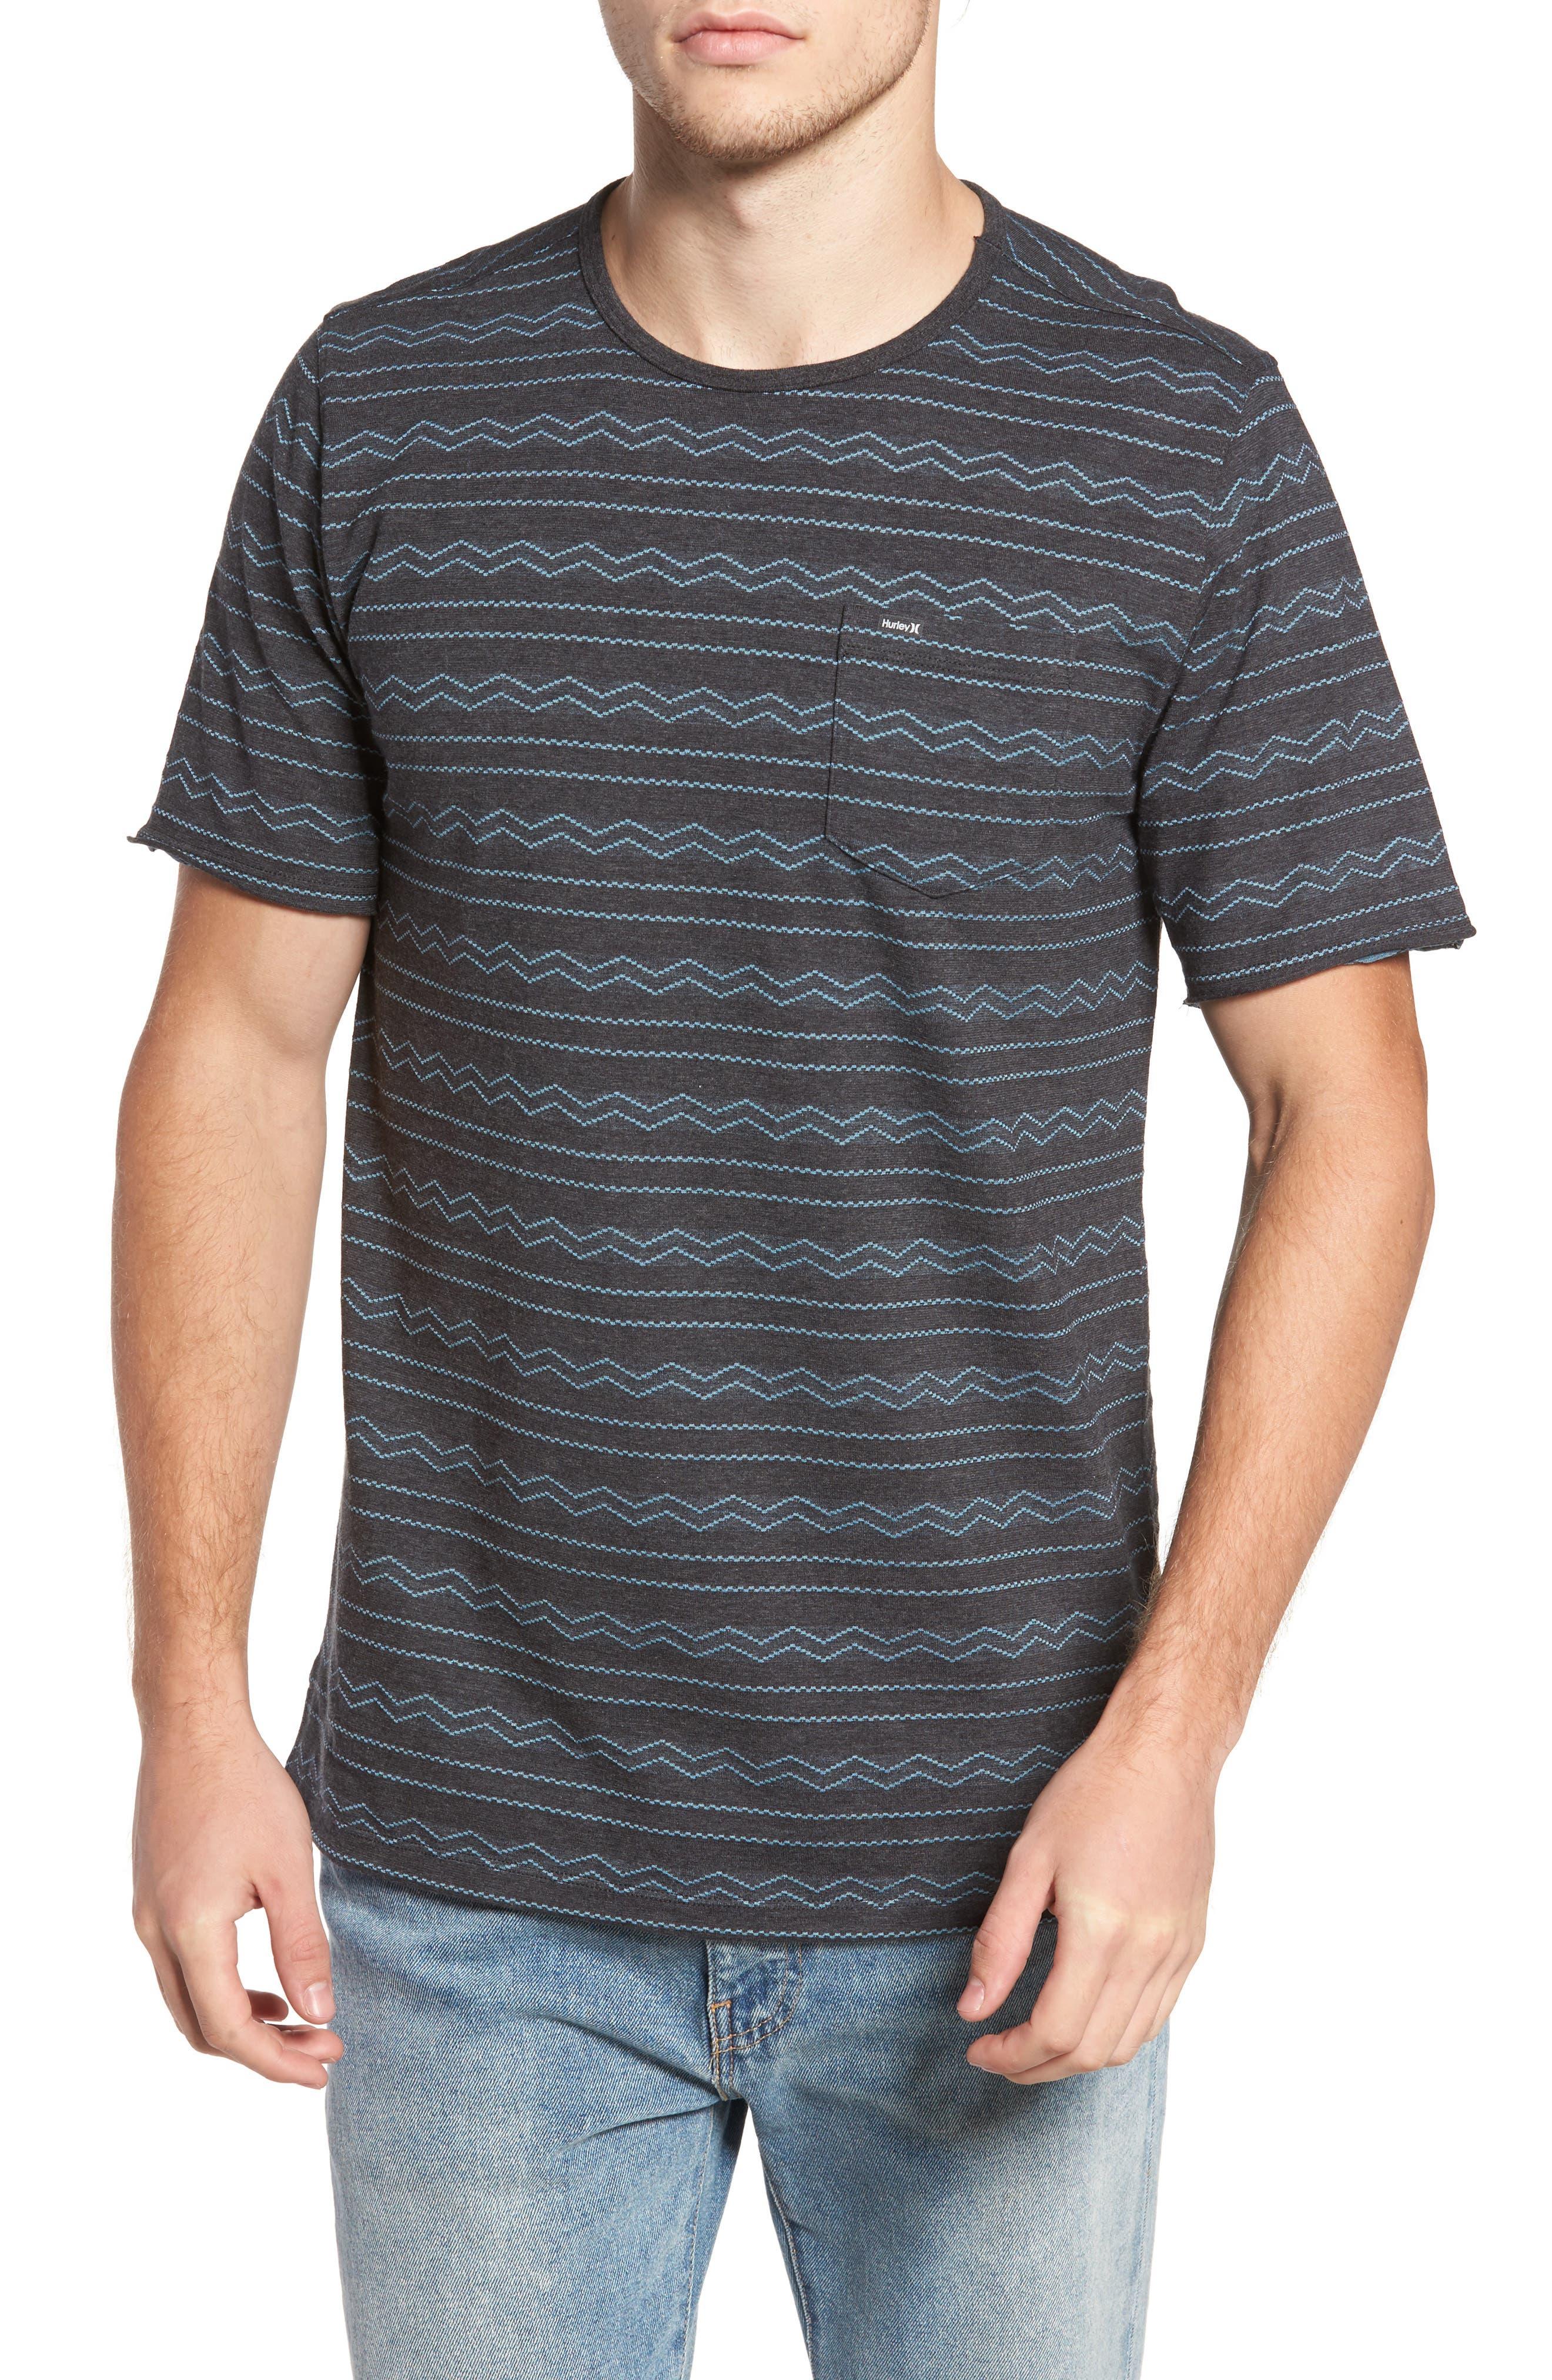 Hurley Pismo Dri-FIT T-Shirt